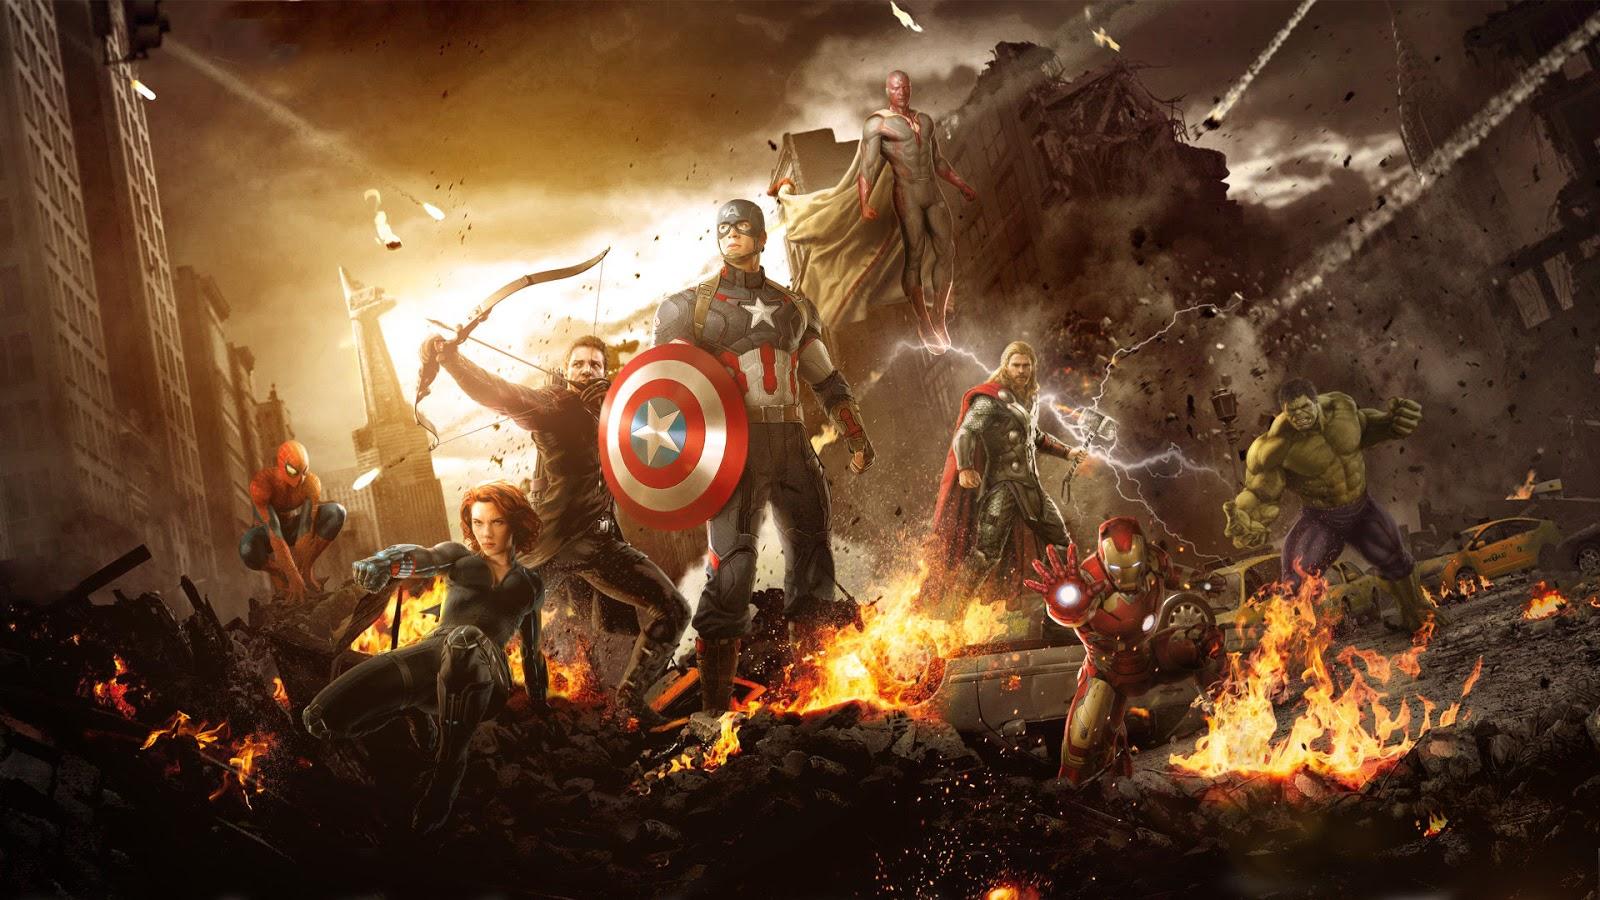 Avengers Infinity War Wallpapers - HD Wallpaper